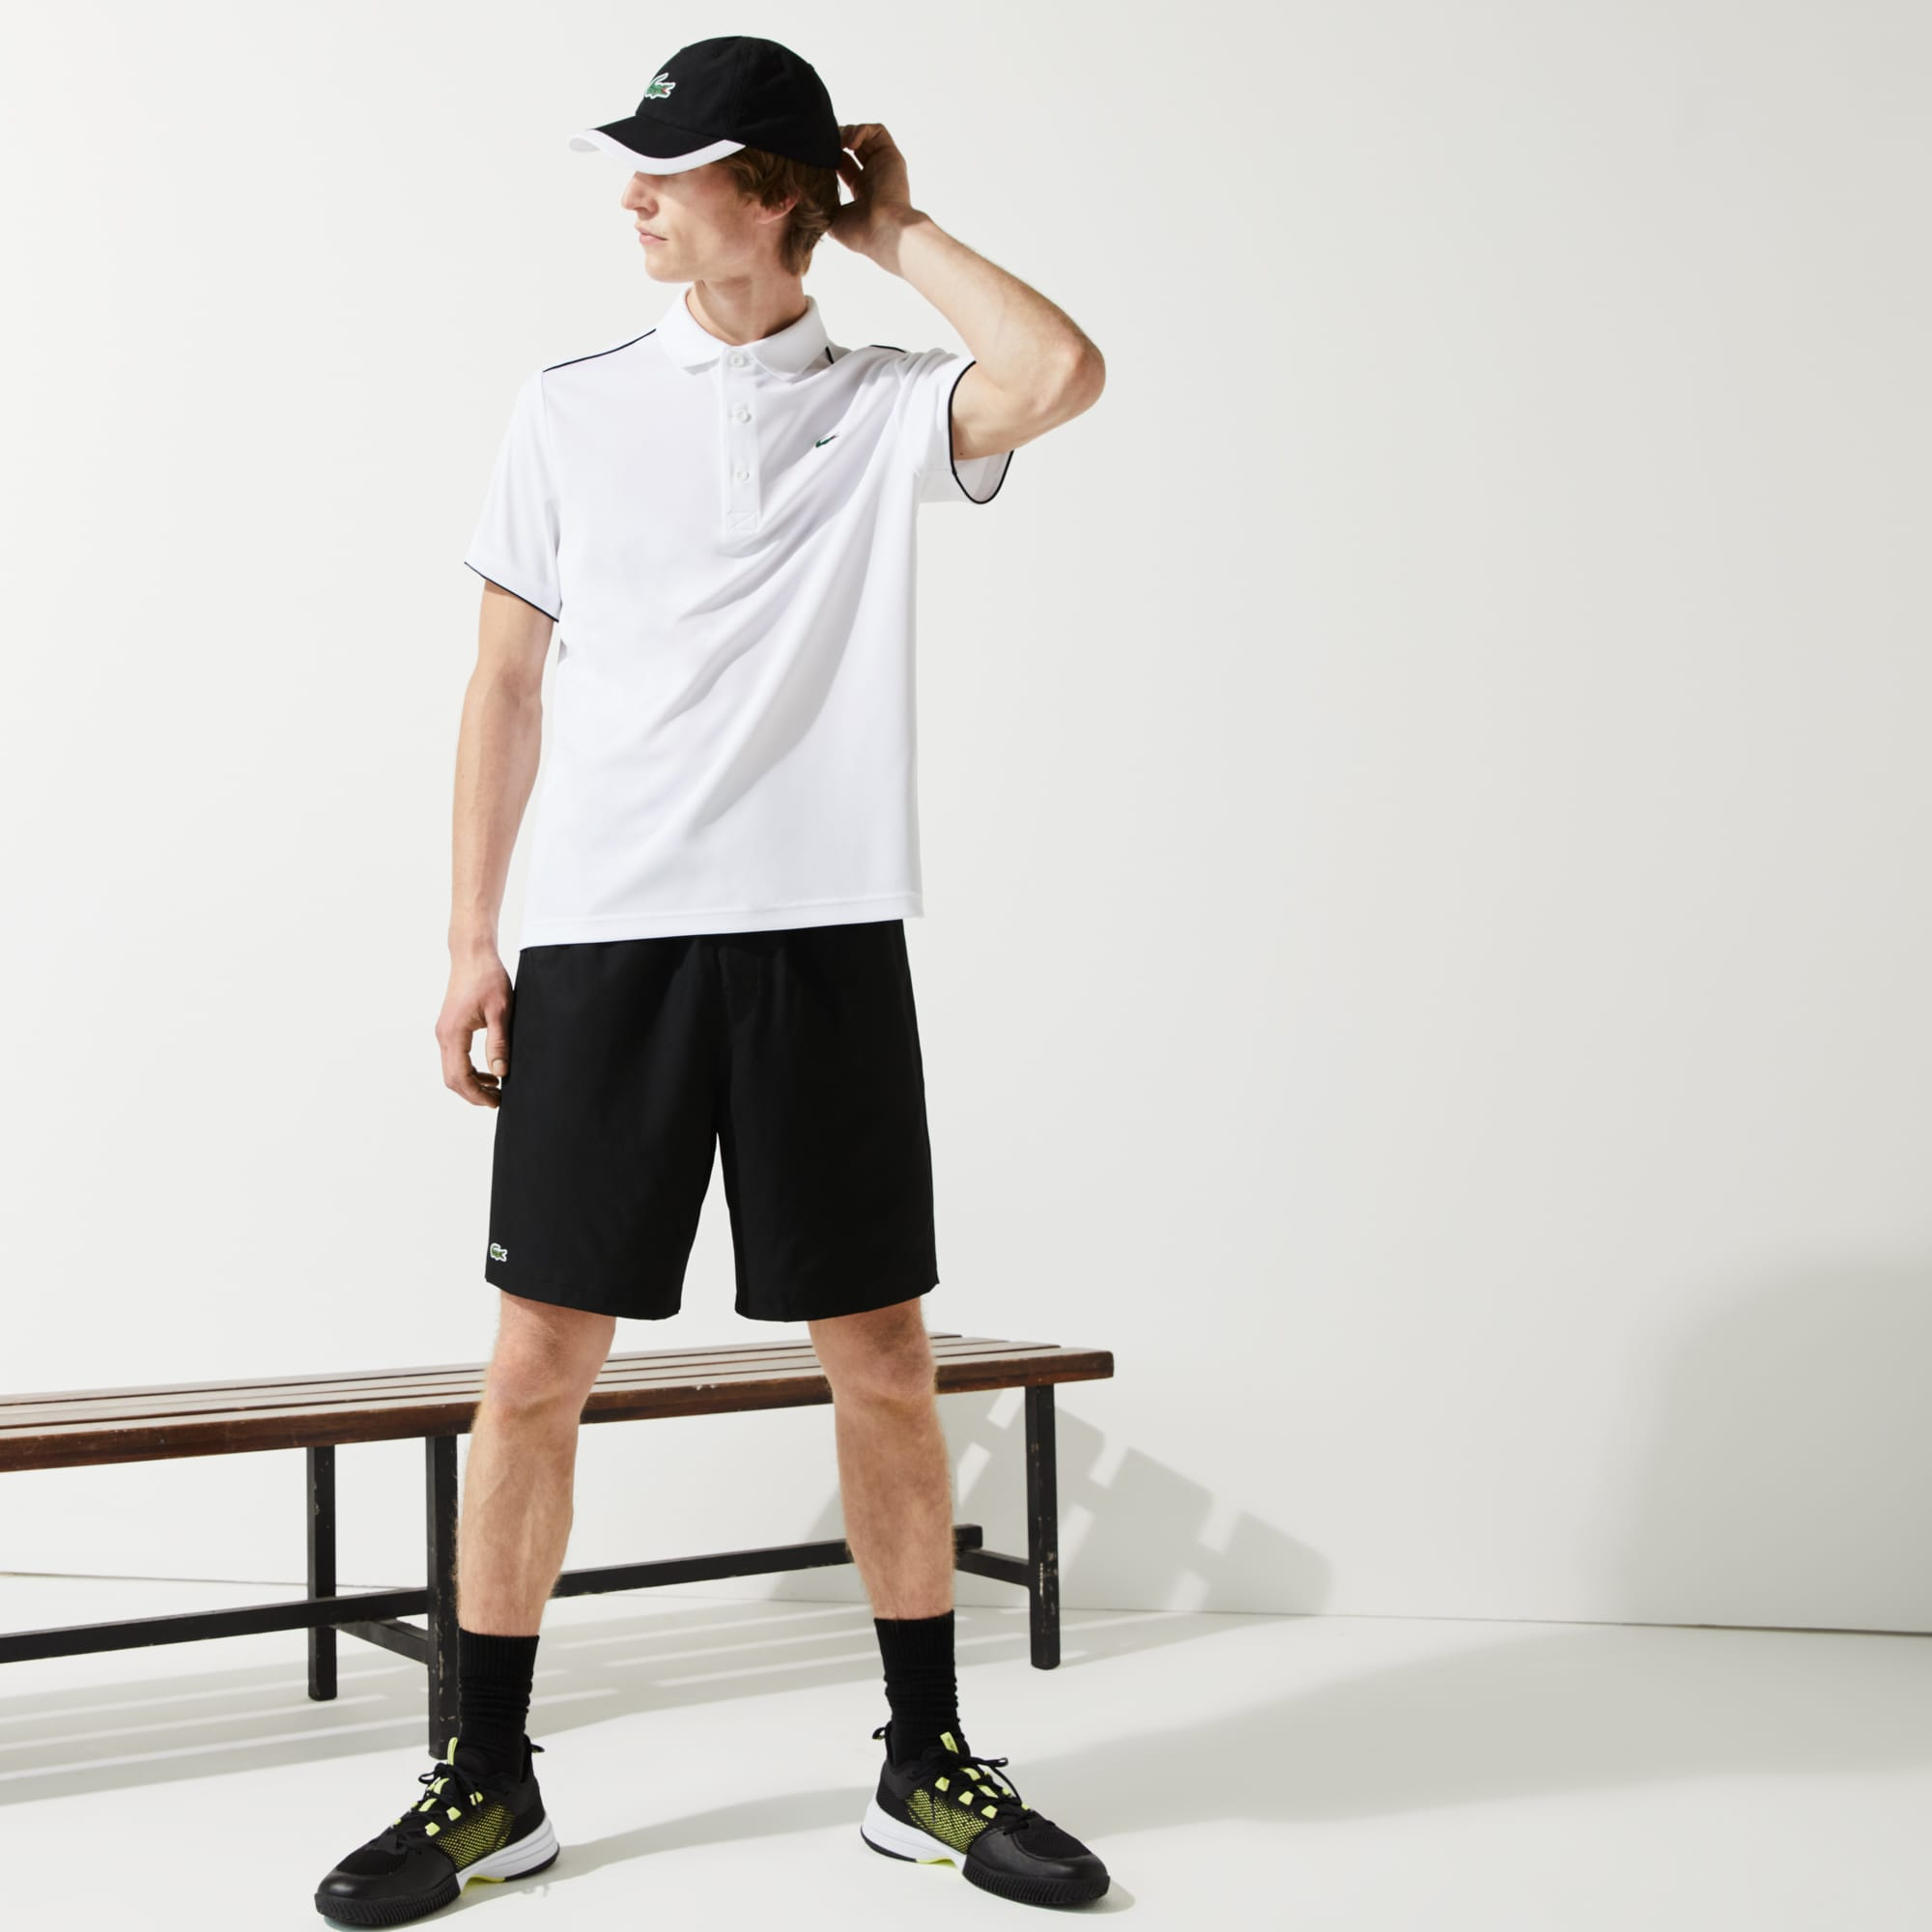 a0551789e468c Lacoste Men s Sport Tennis Shorts In Black